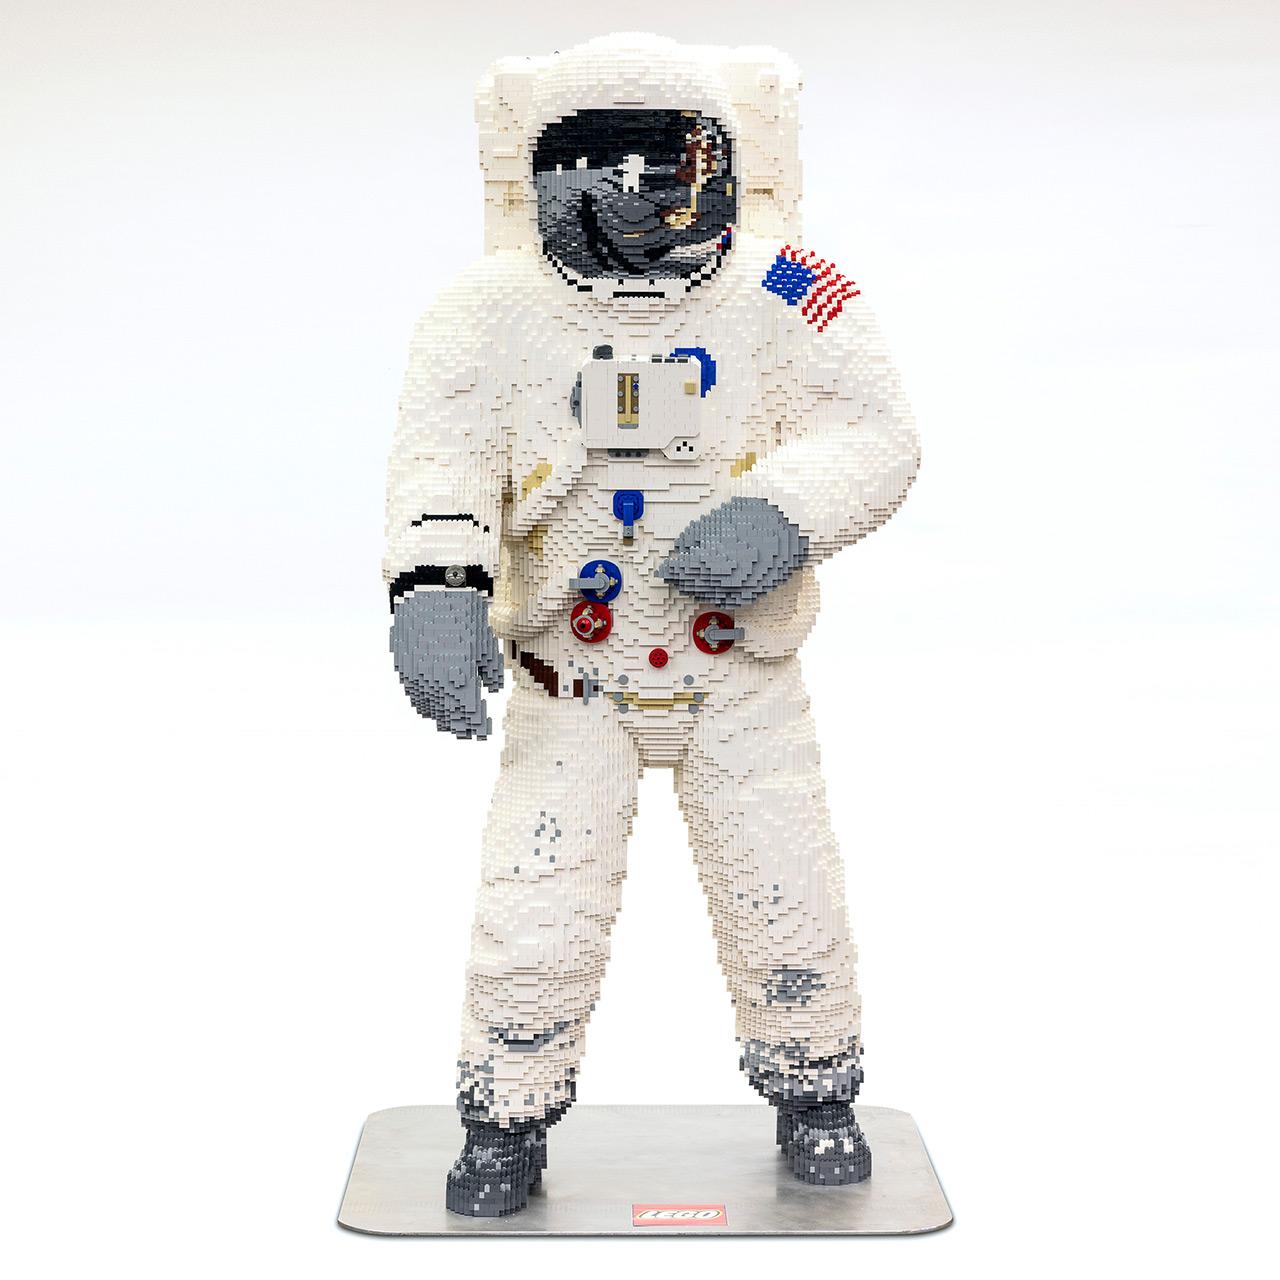 LEGO exhibits life-size moonwalker model at Apollo 50 Festival